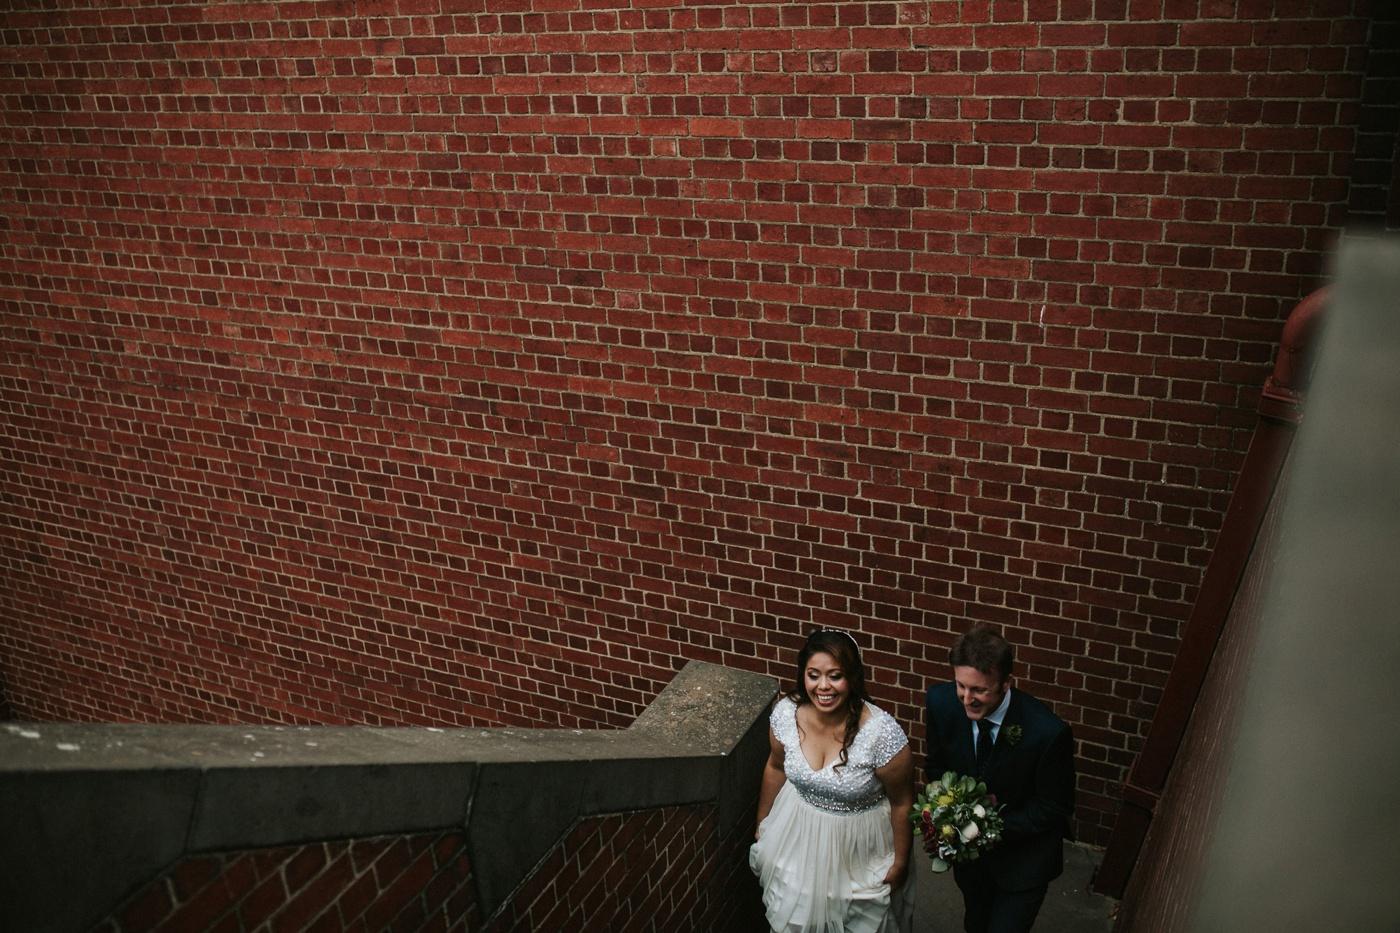 anitadaniel_melbourne-scienceworks-relaxed-fun-geek-wedding_melbourne-candid-wedding-photography_12